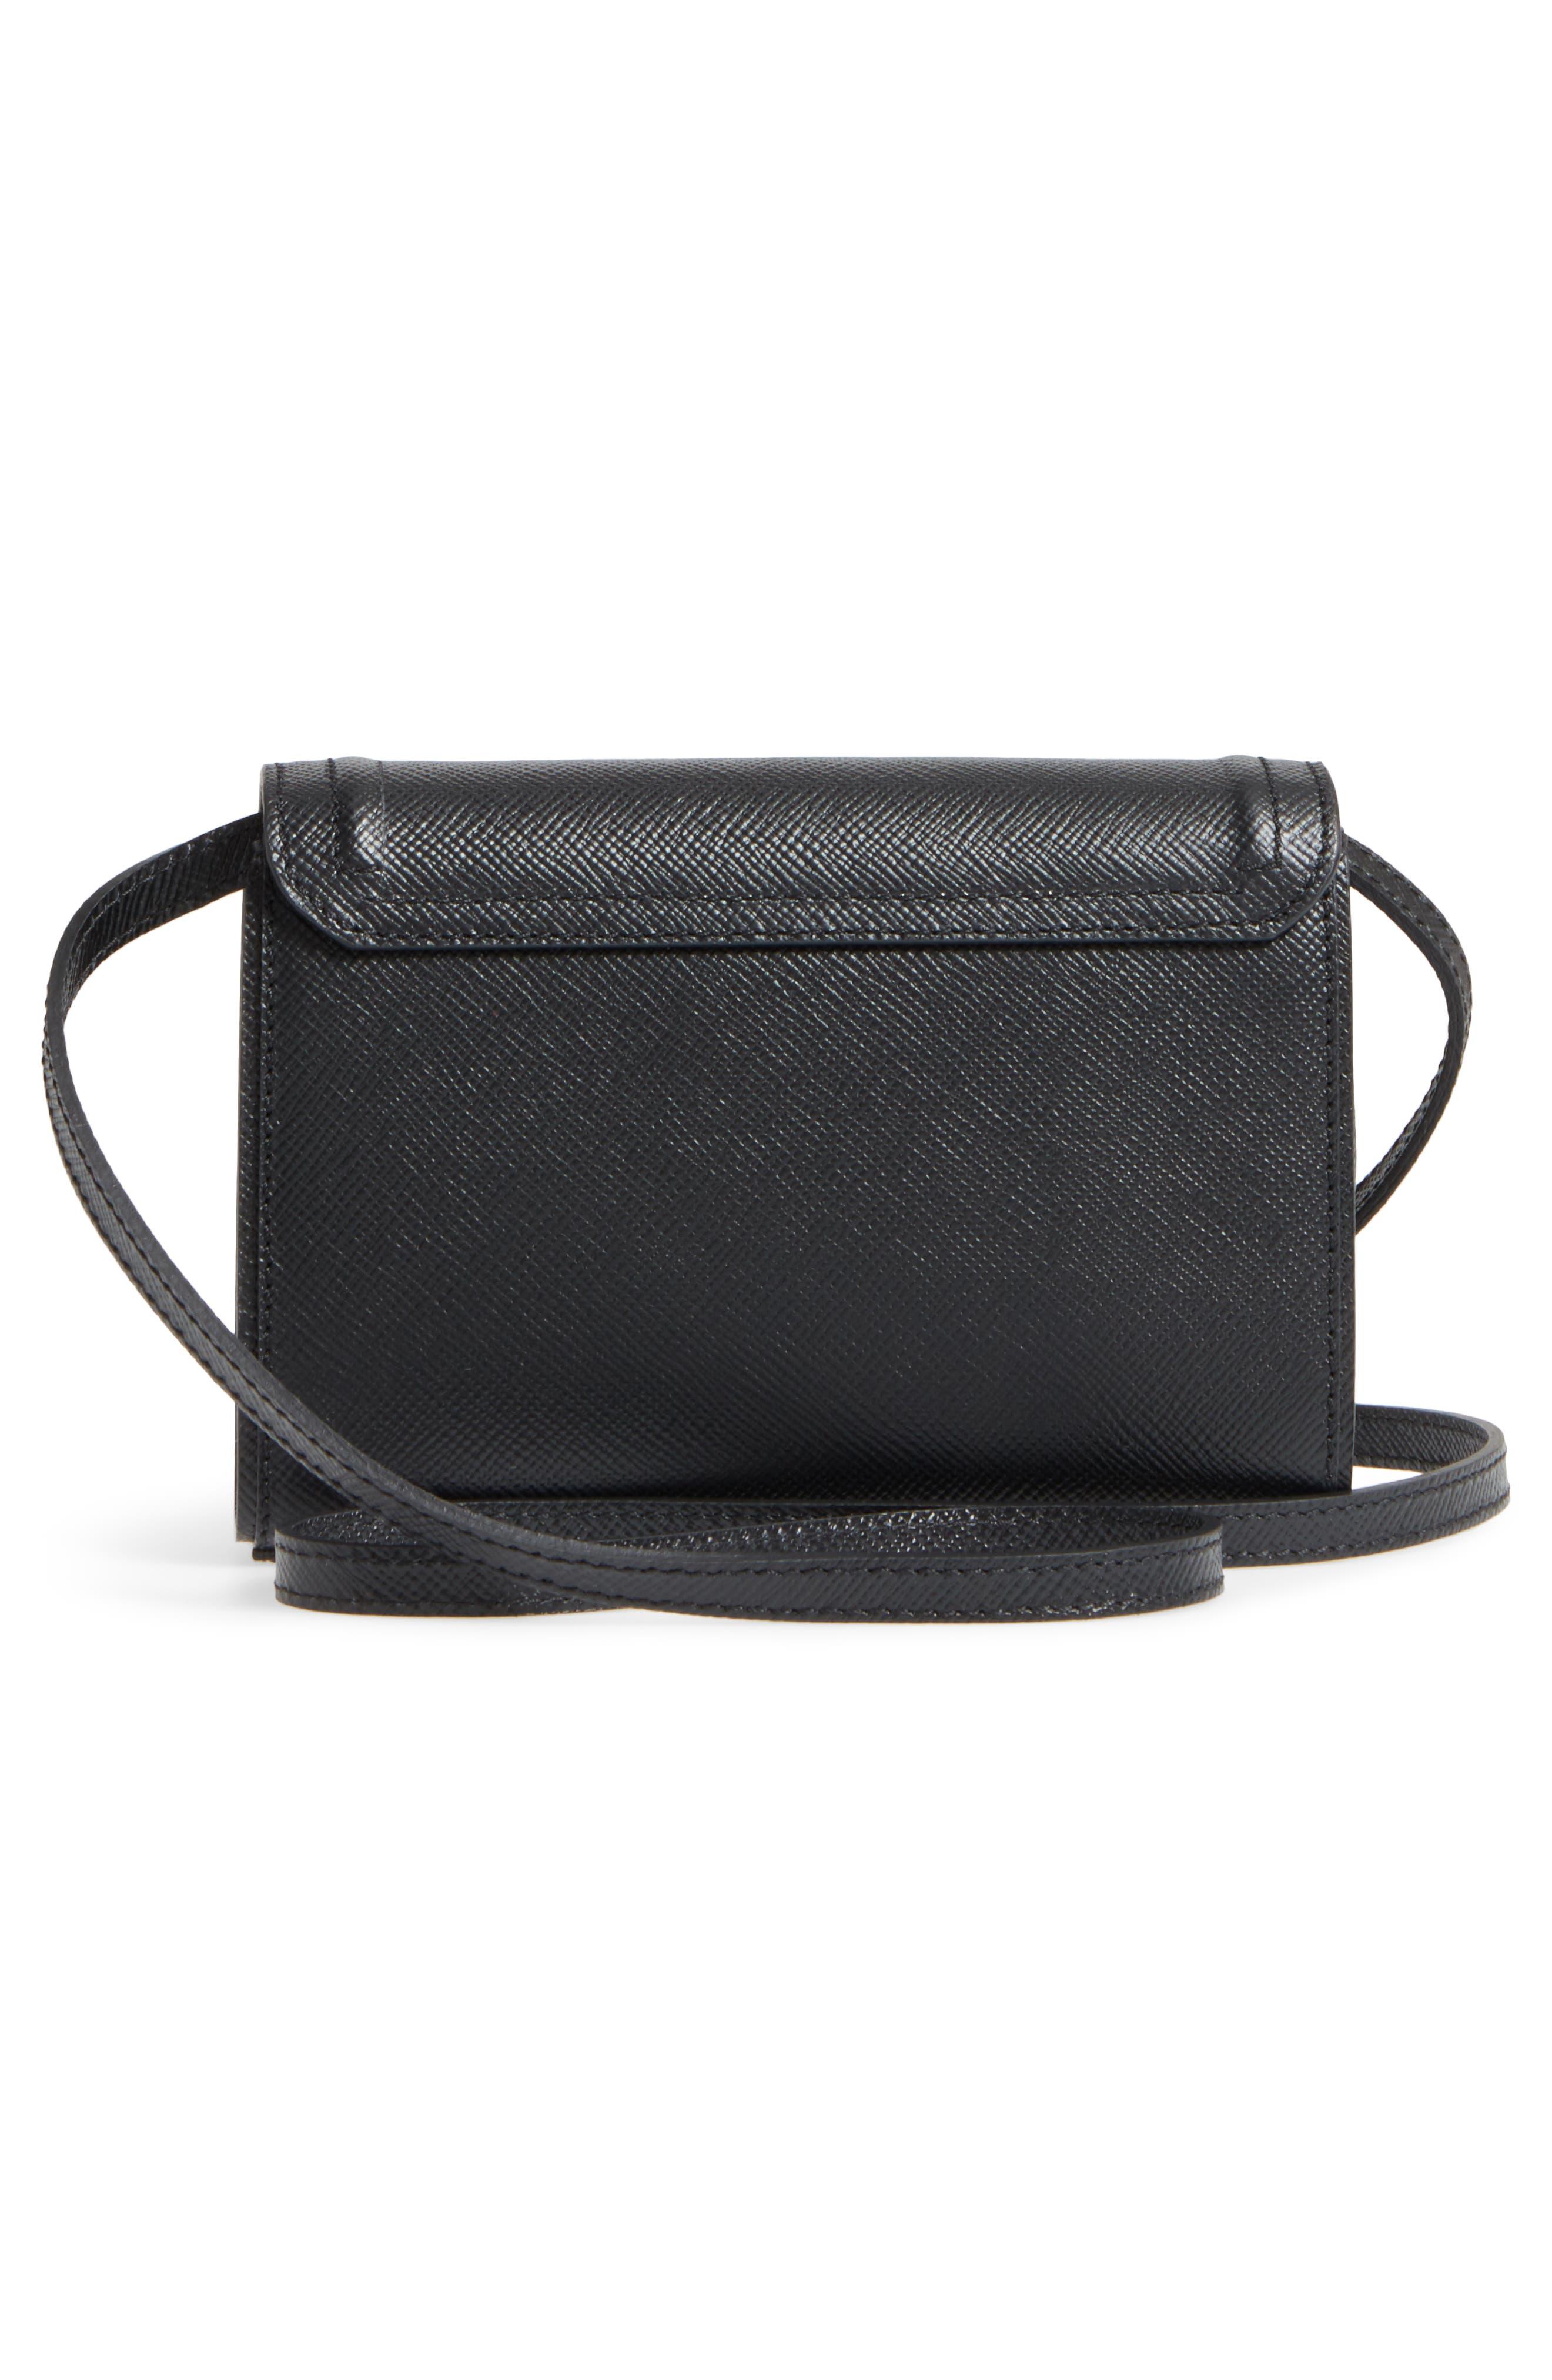 Mini Ilenea Leather Crossbody Bag,                             Alternate thumbnail 4, color,                             001